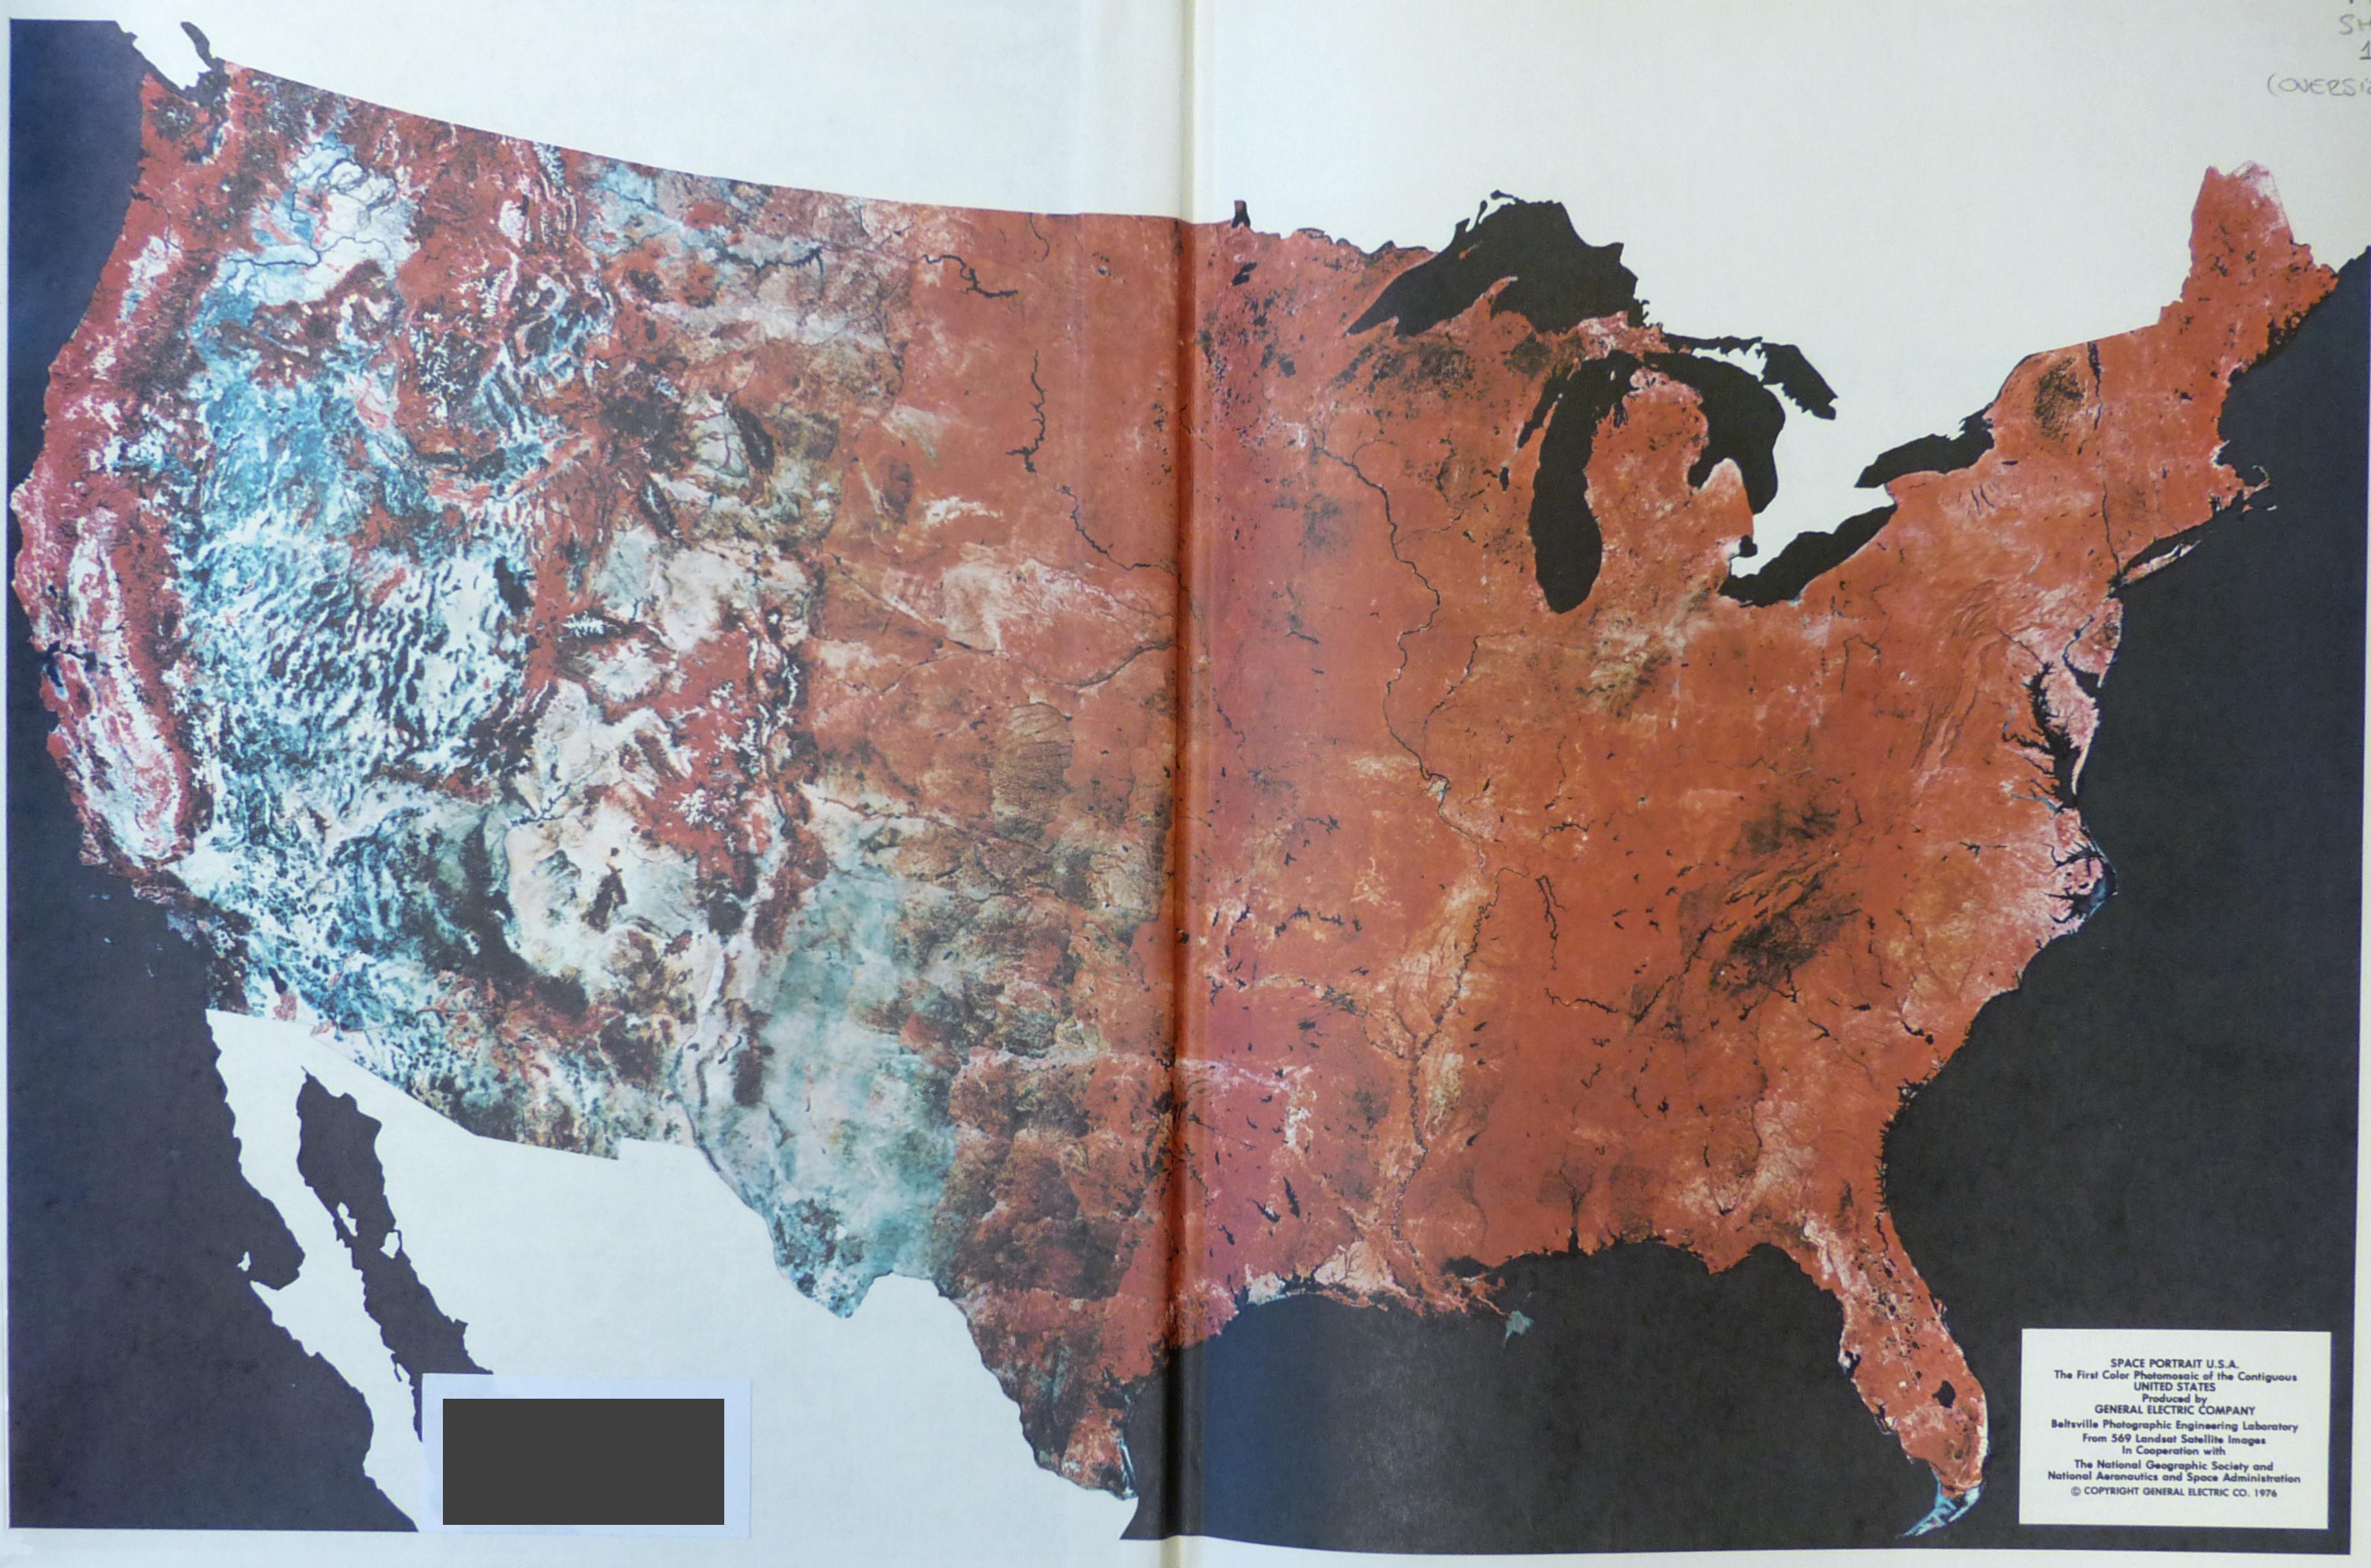 Landsat Views the World